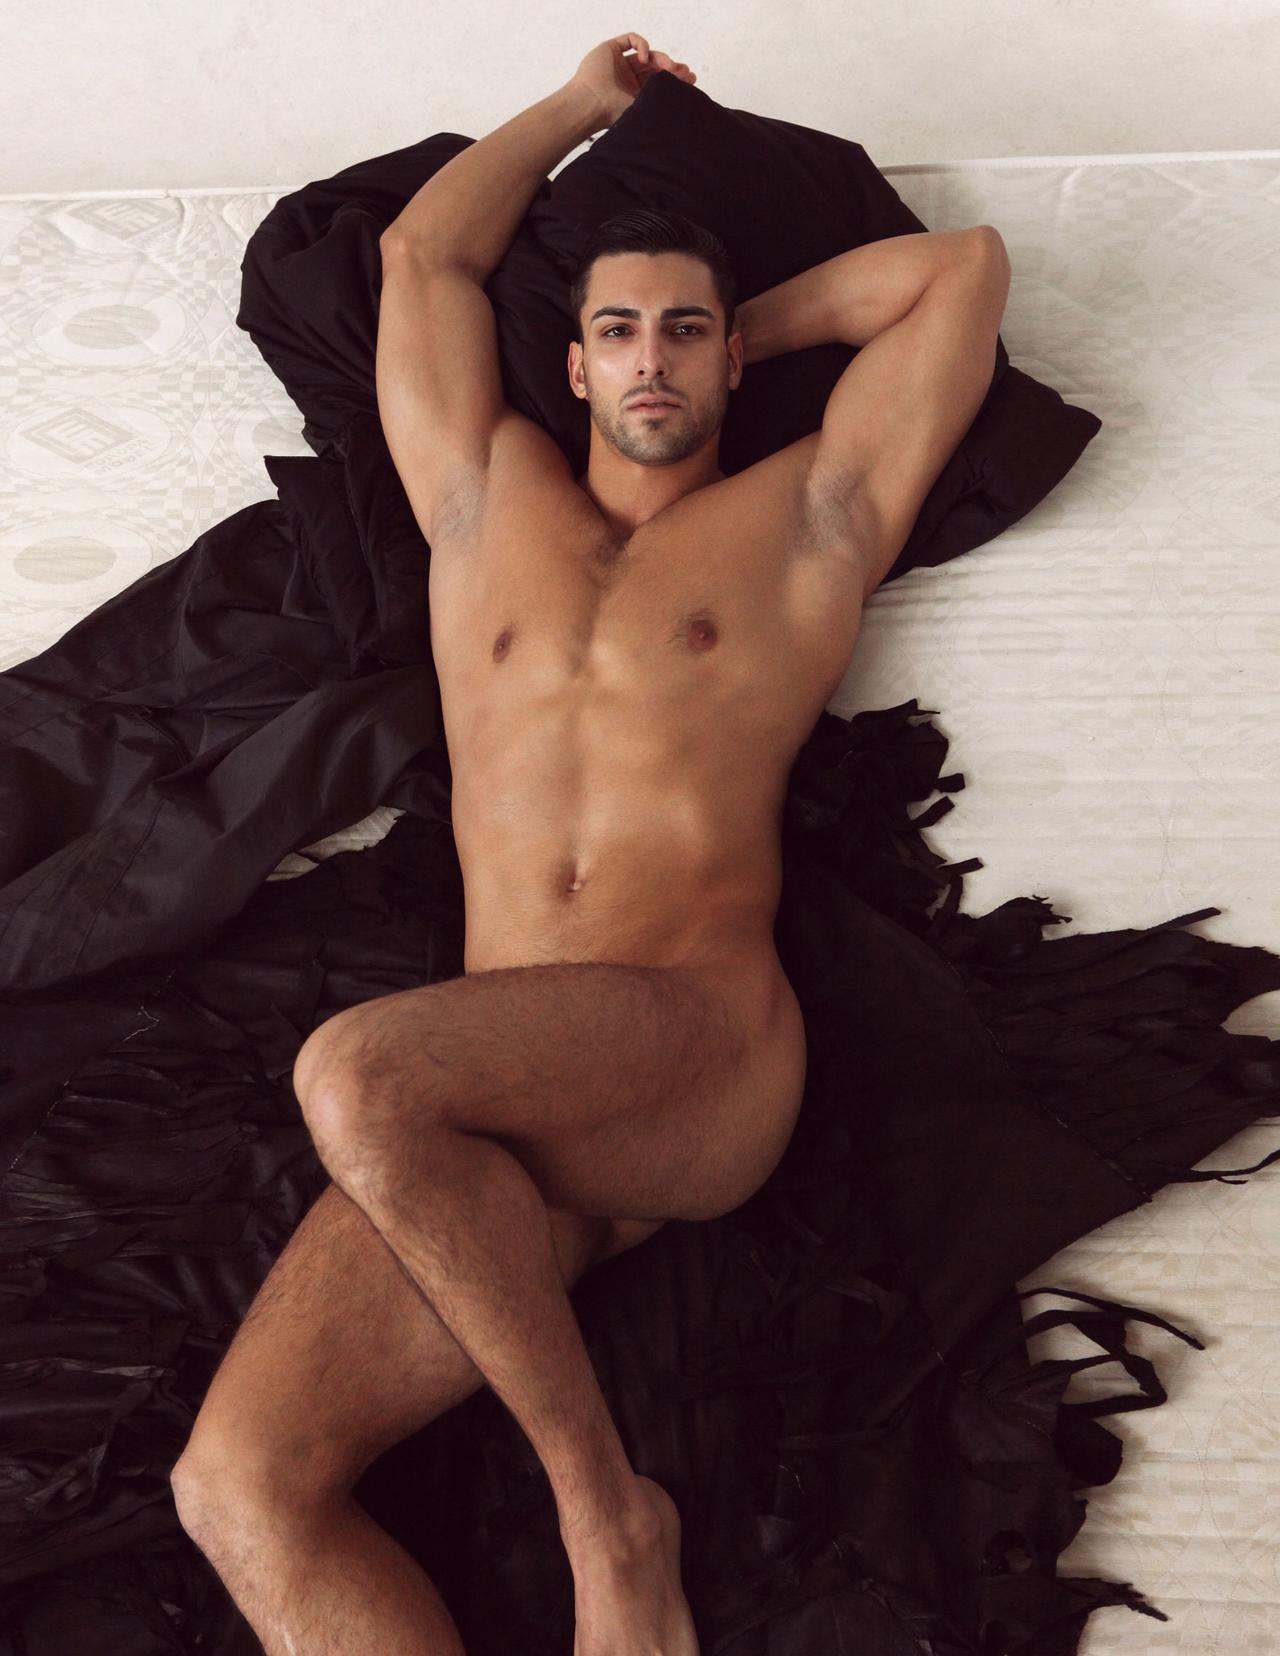 Amaral Desnuda desnudo homme: jan palkolukas kimlicka – image amplified